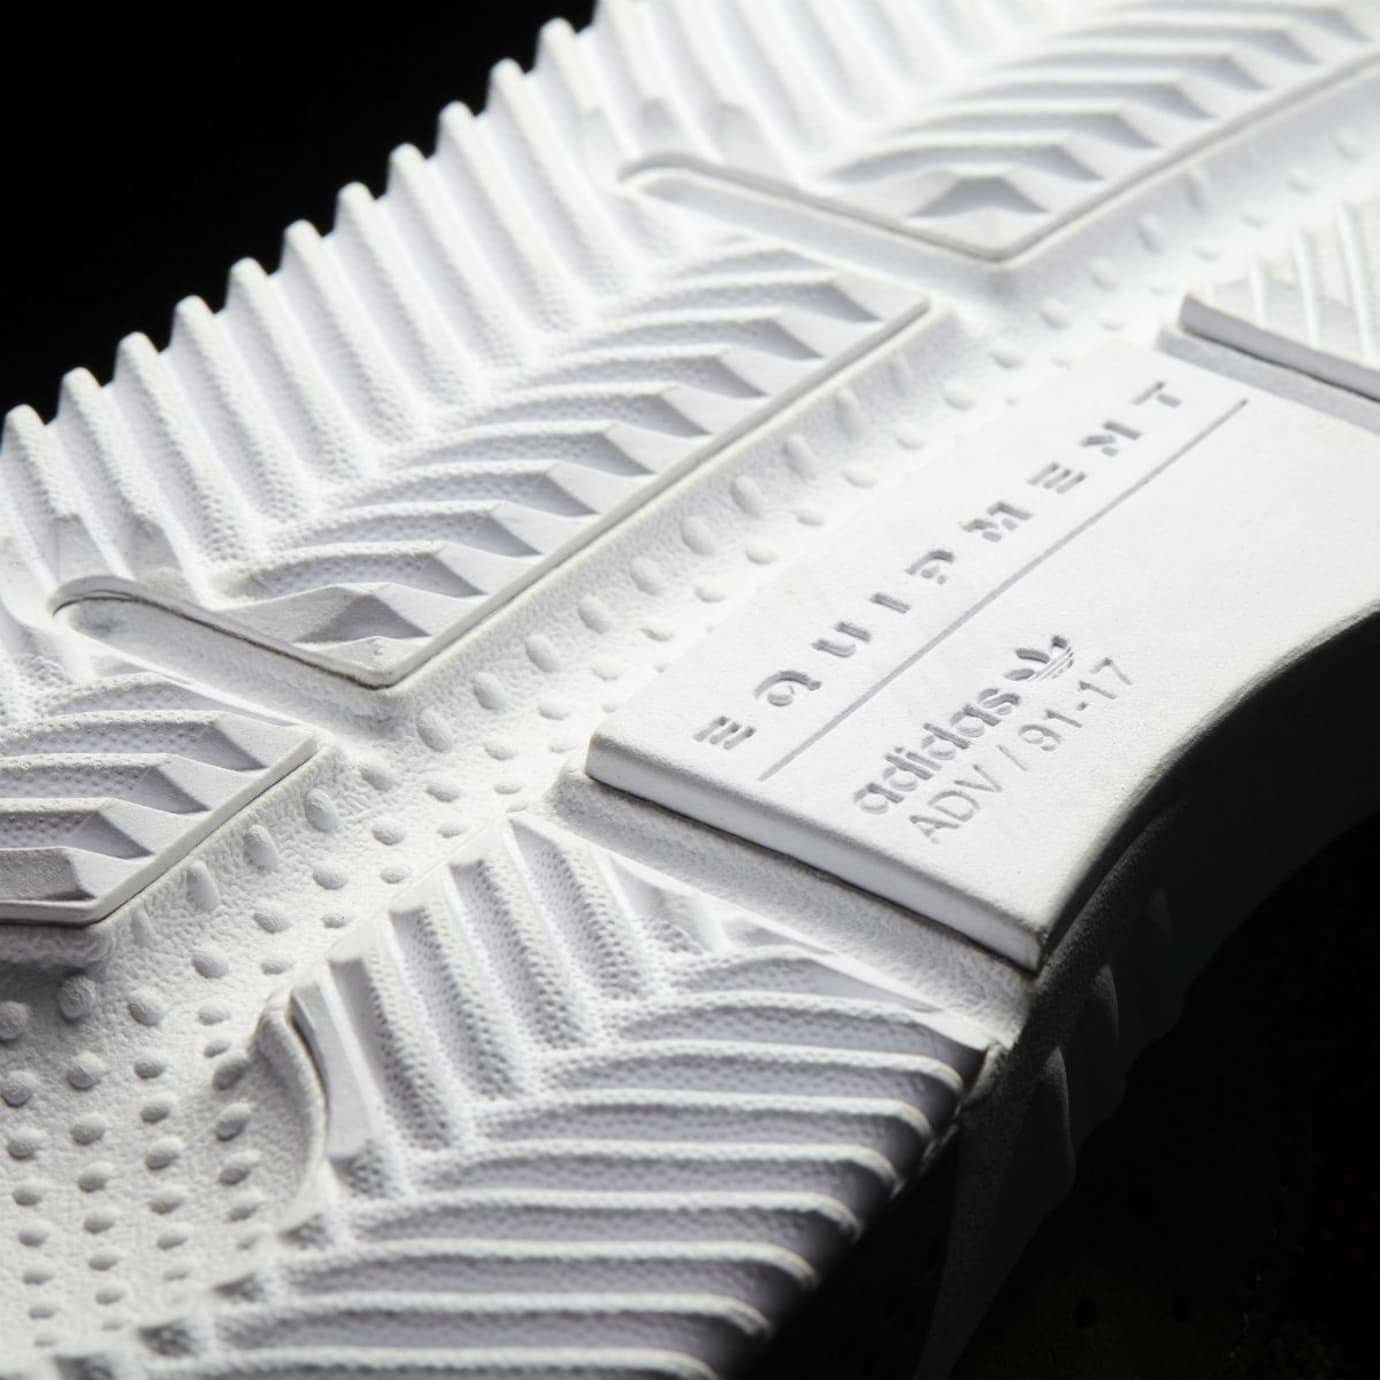 online retailer daeda fae73 Adidas EQT Cushion ADV Olive Camo Release Date AC7722 Outsole